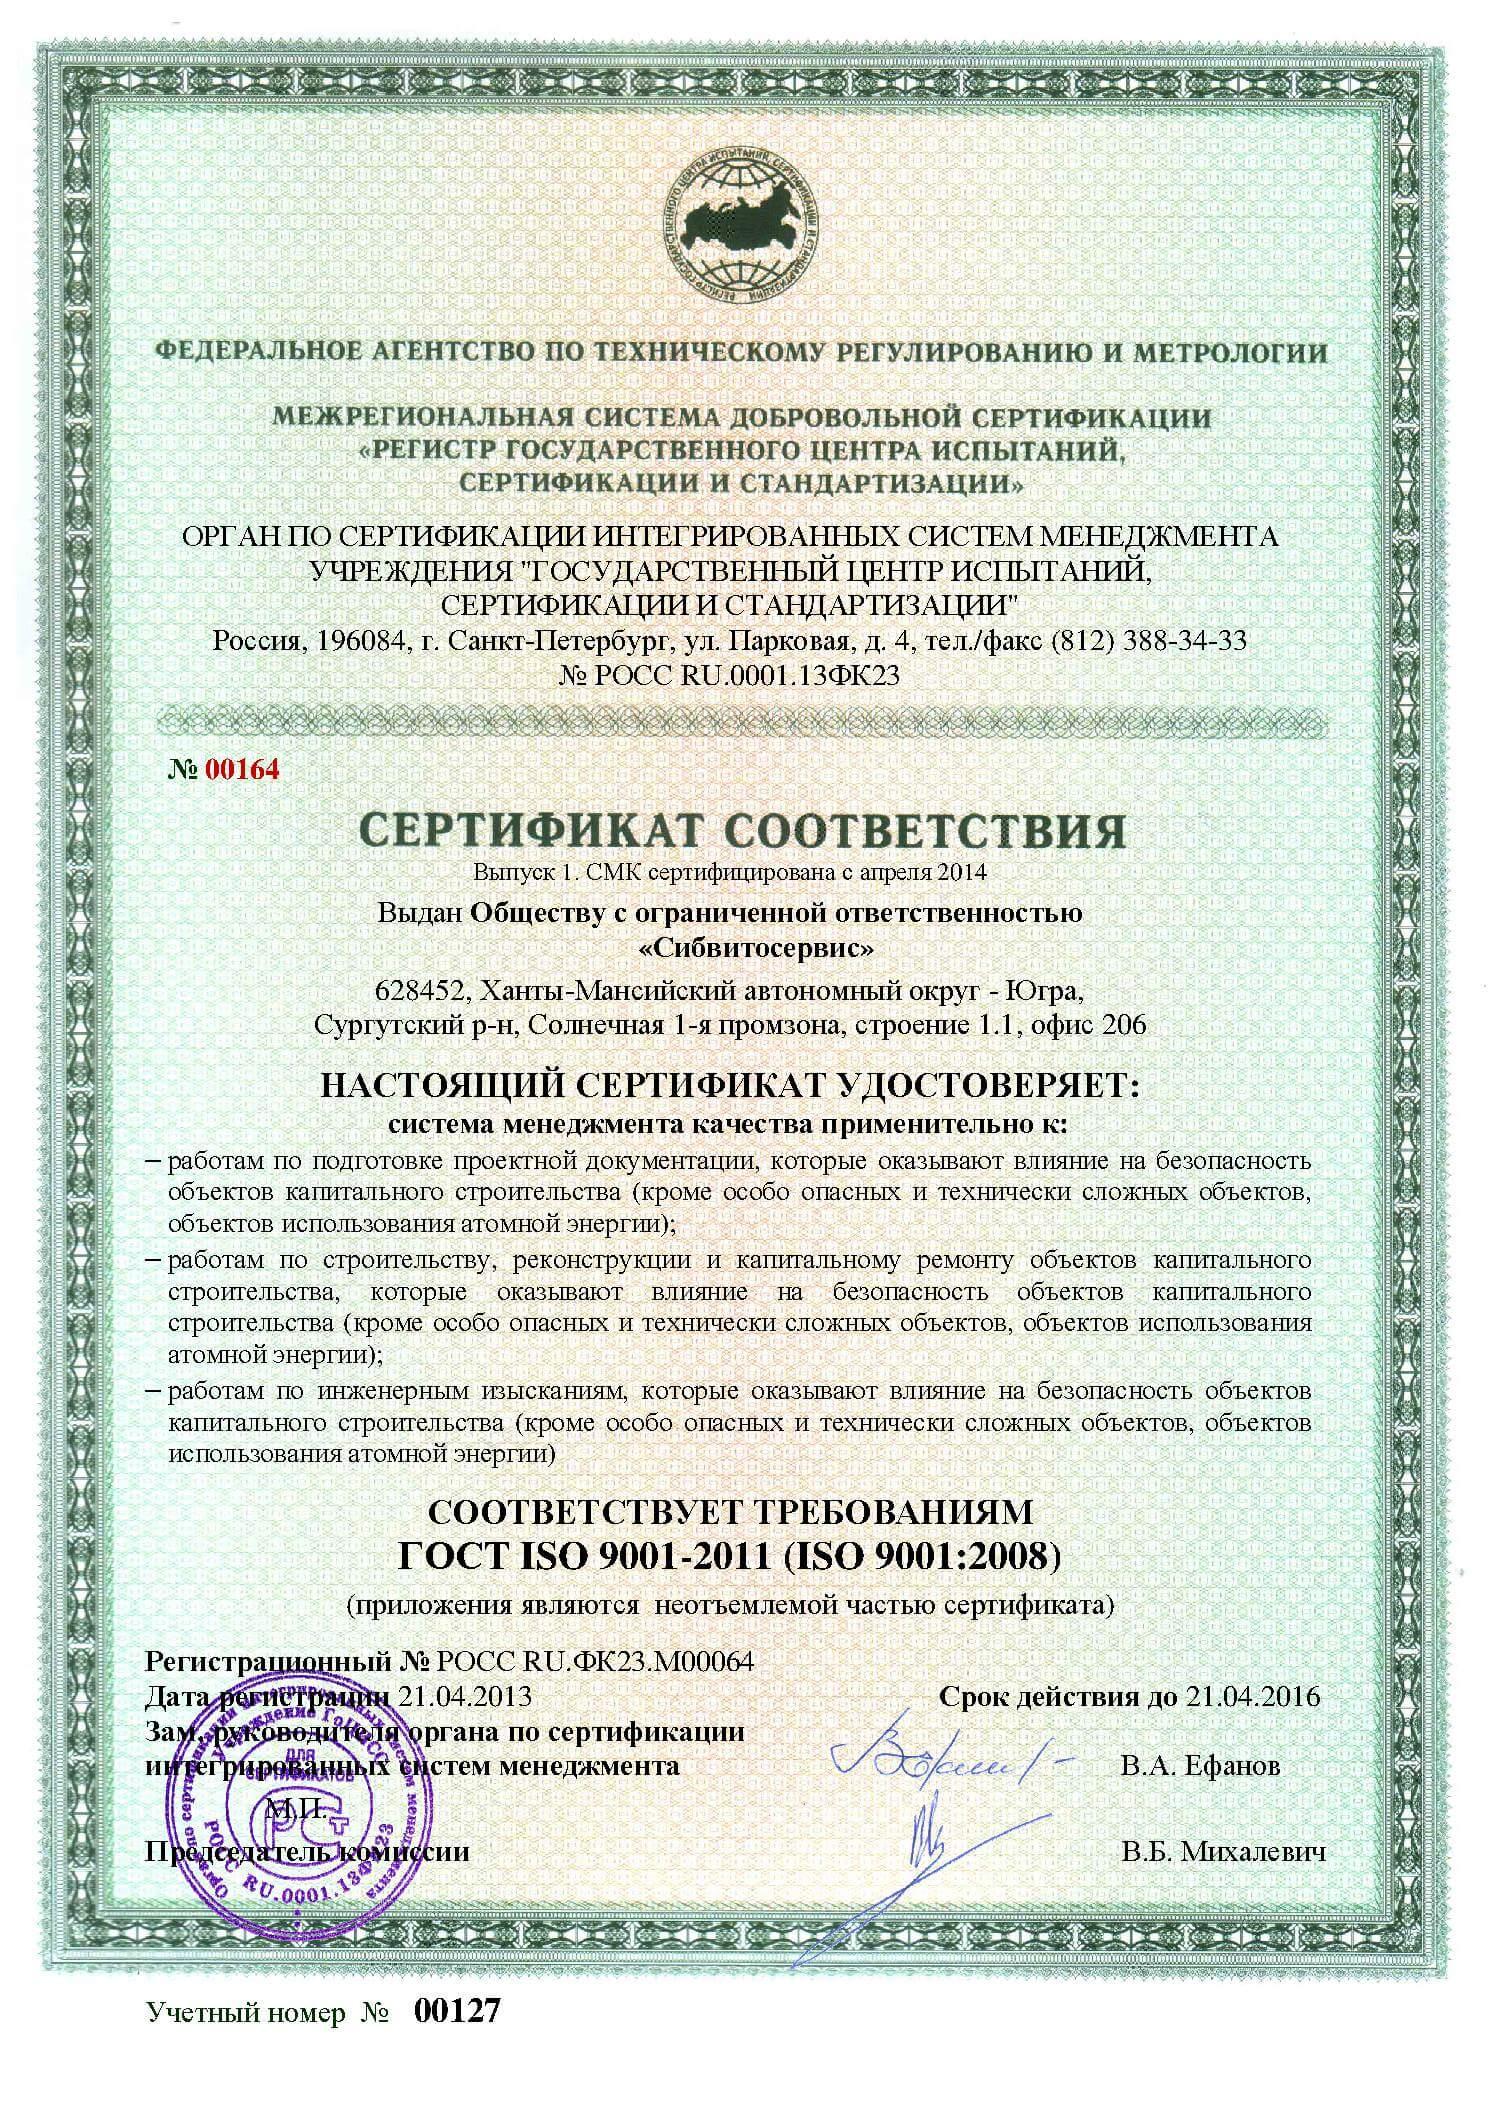 Смк соответствует требованиям гост iso 9001-2011 (iso 9001:2008).